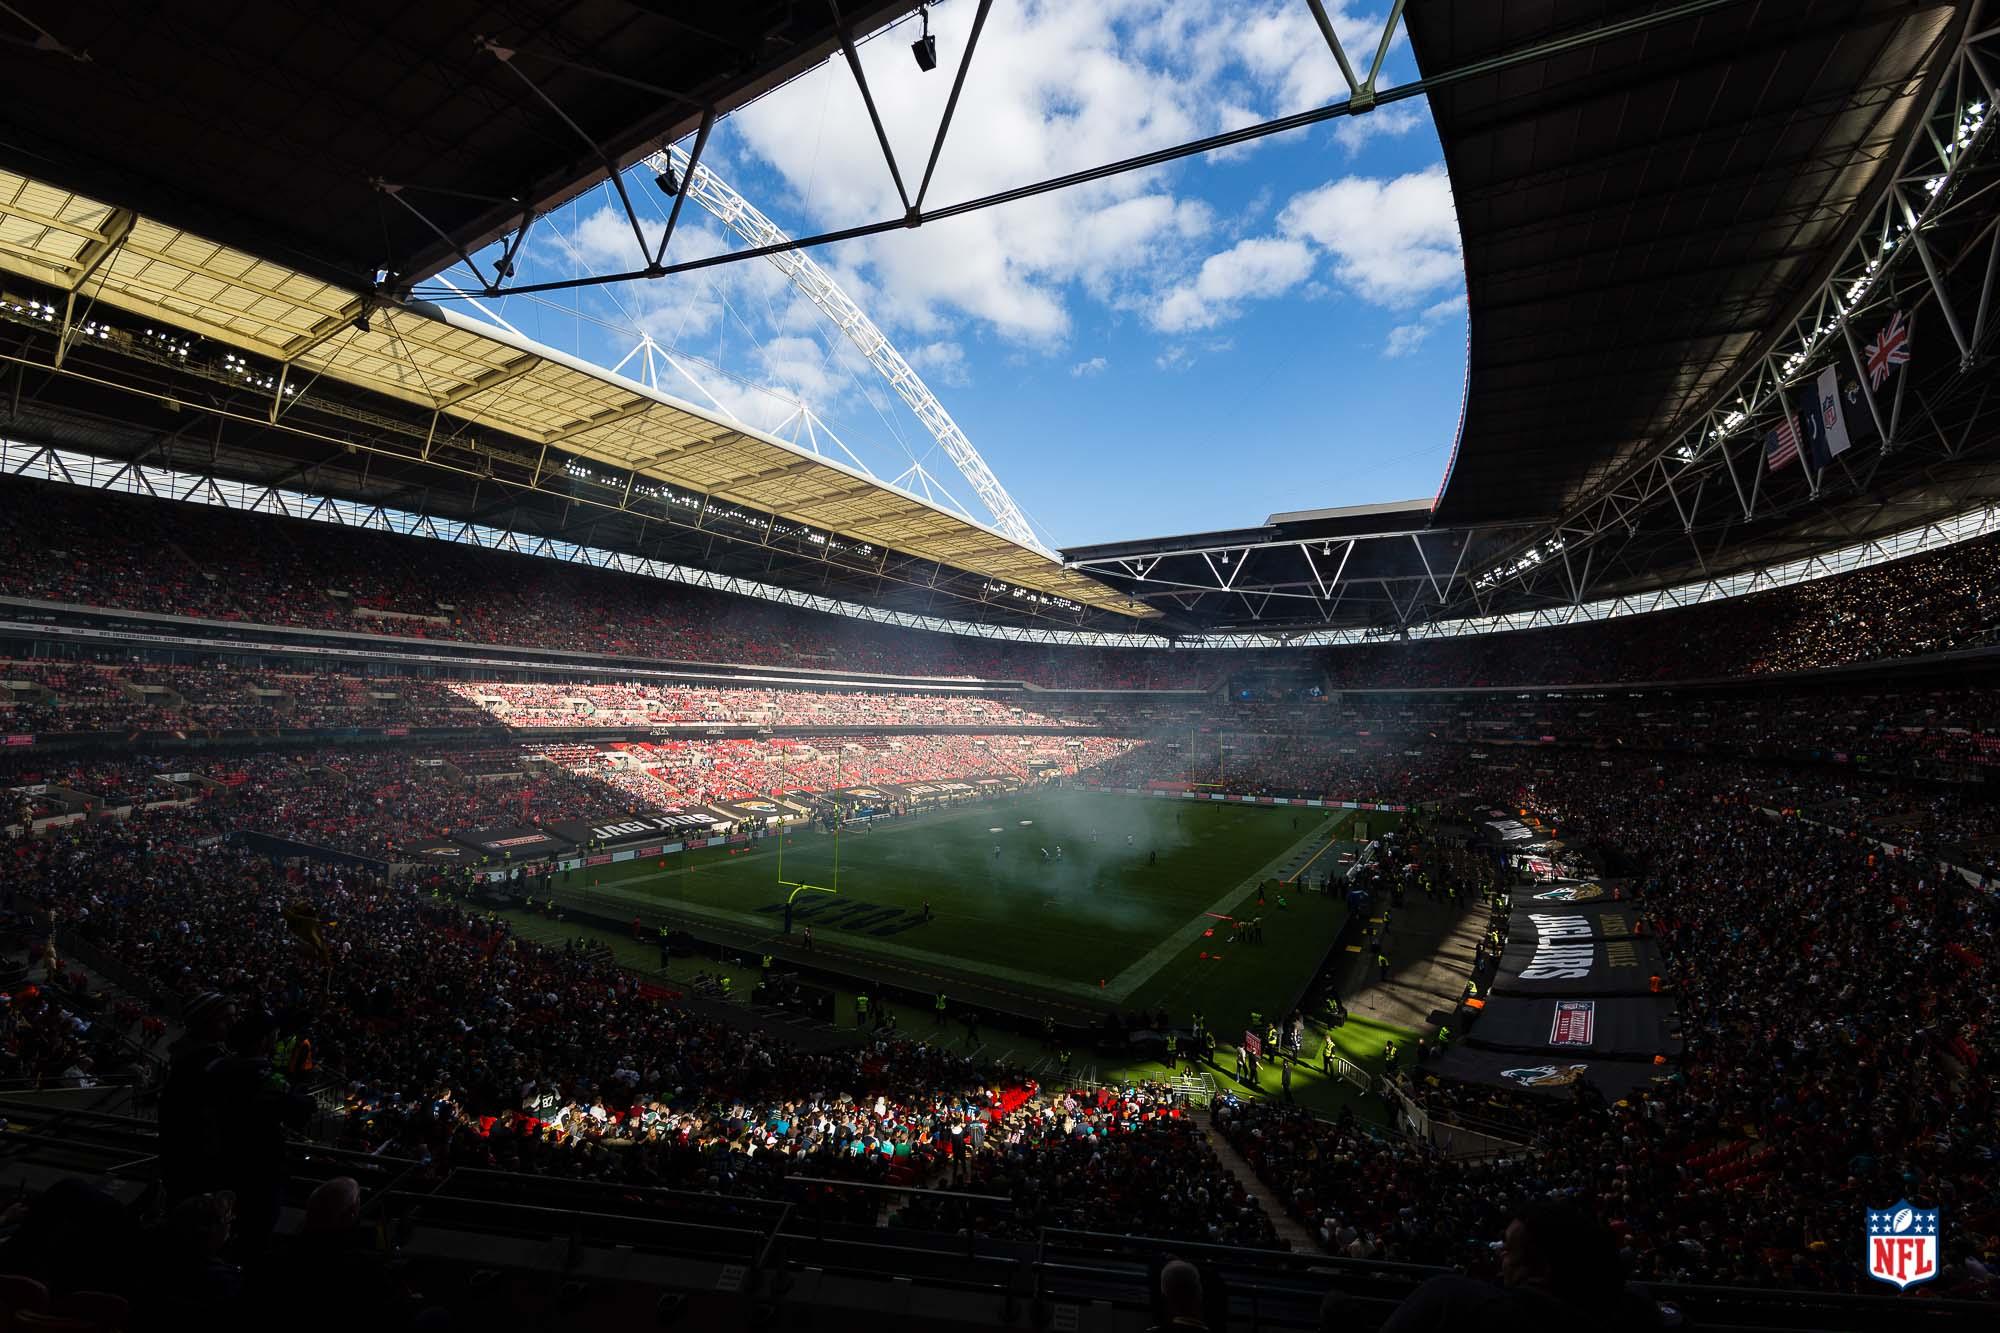 017_161002_London_NFL_G15_1041019.jpg